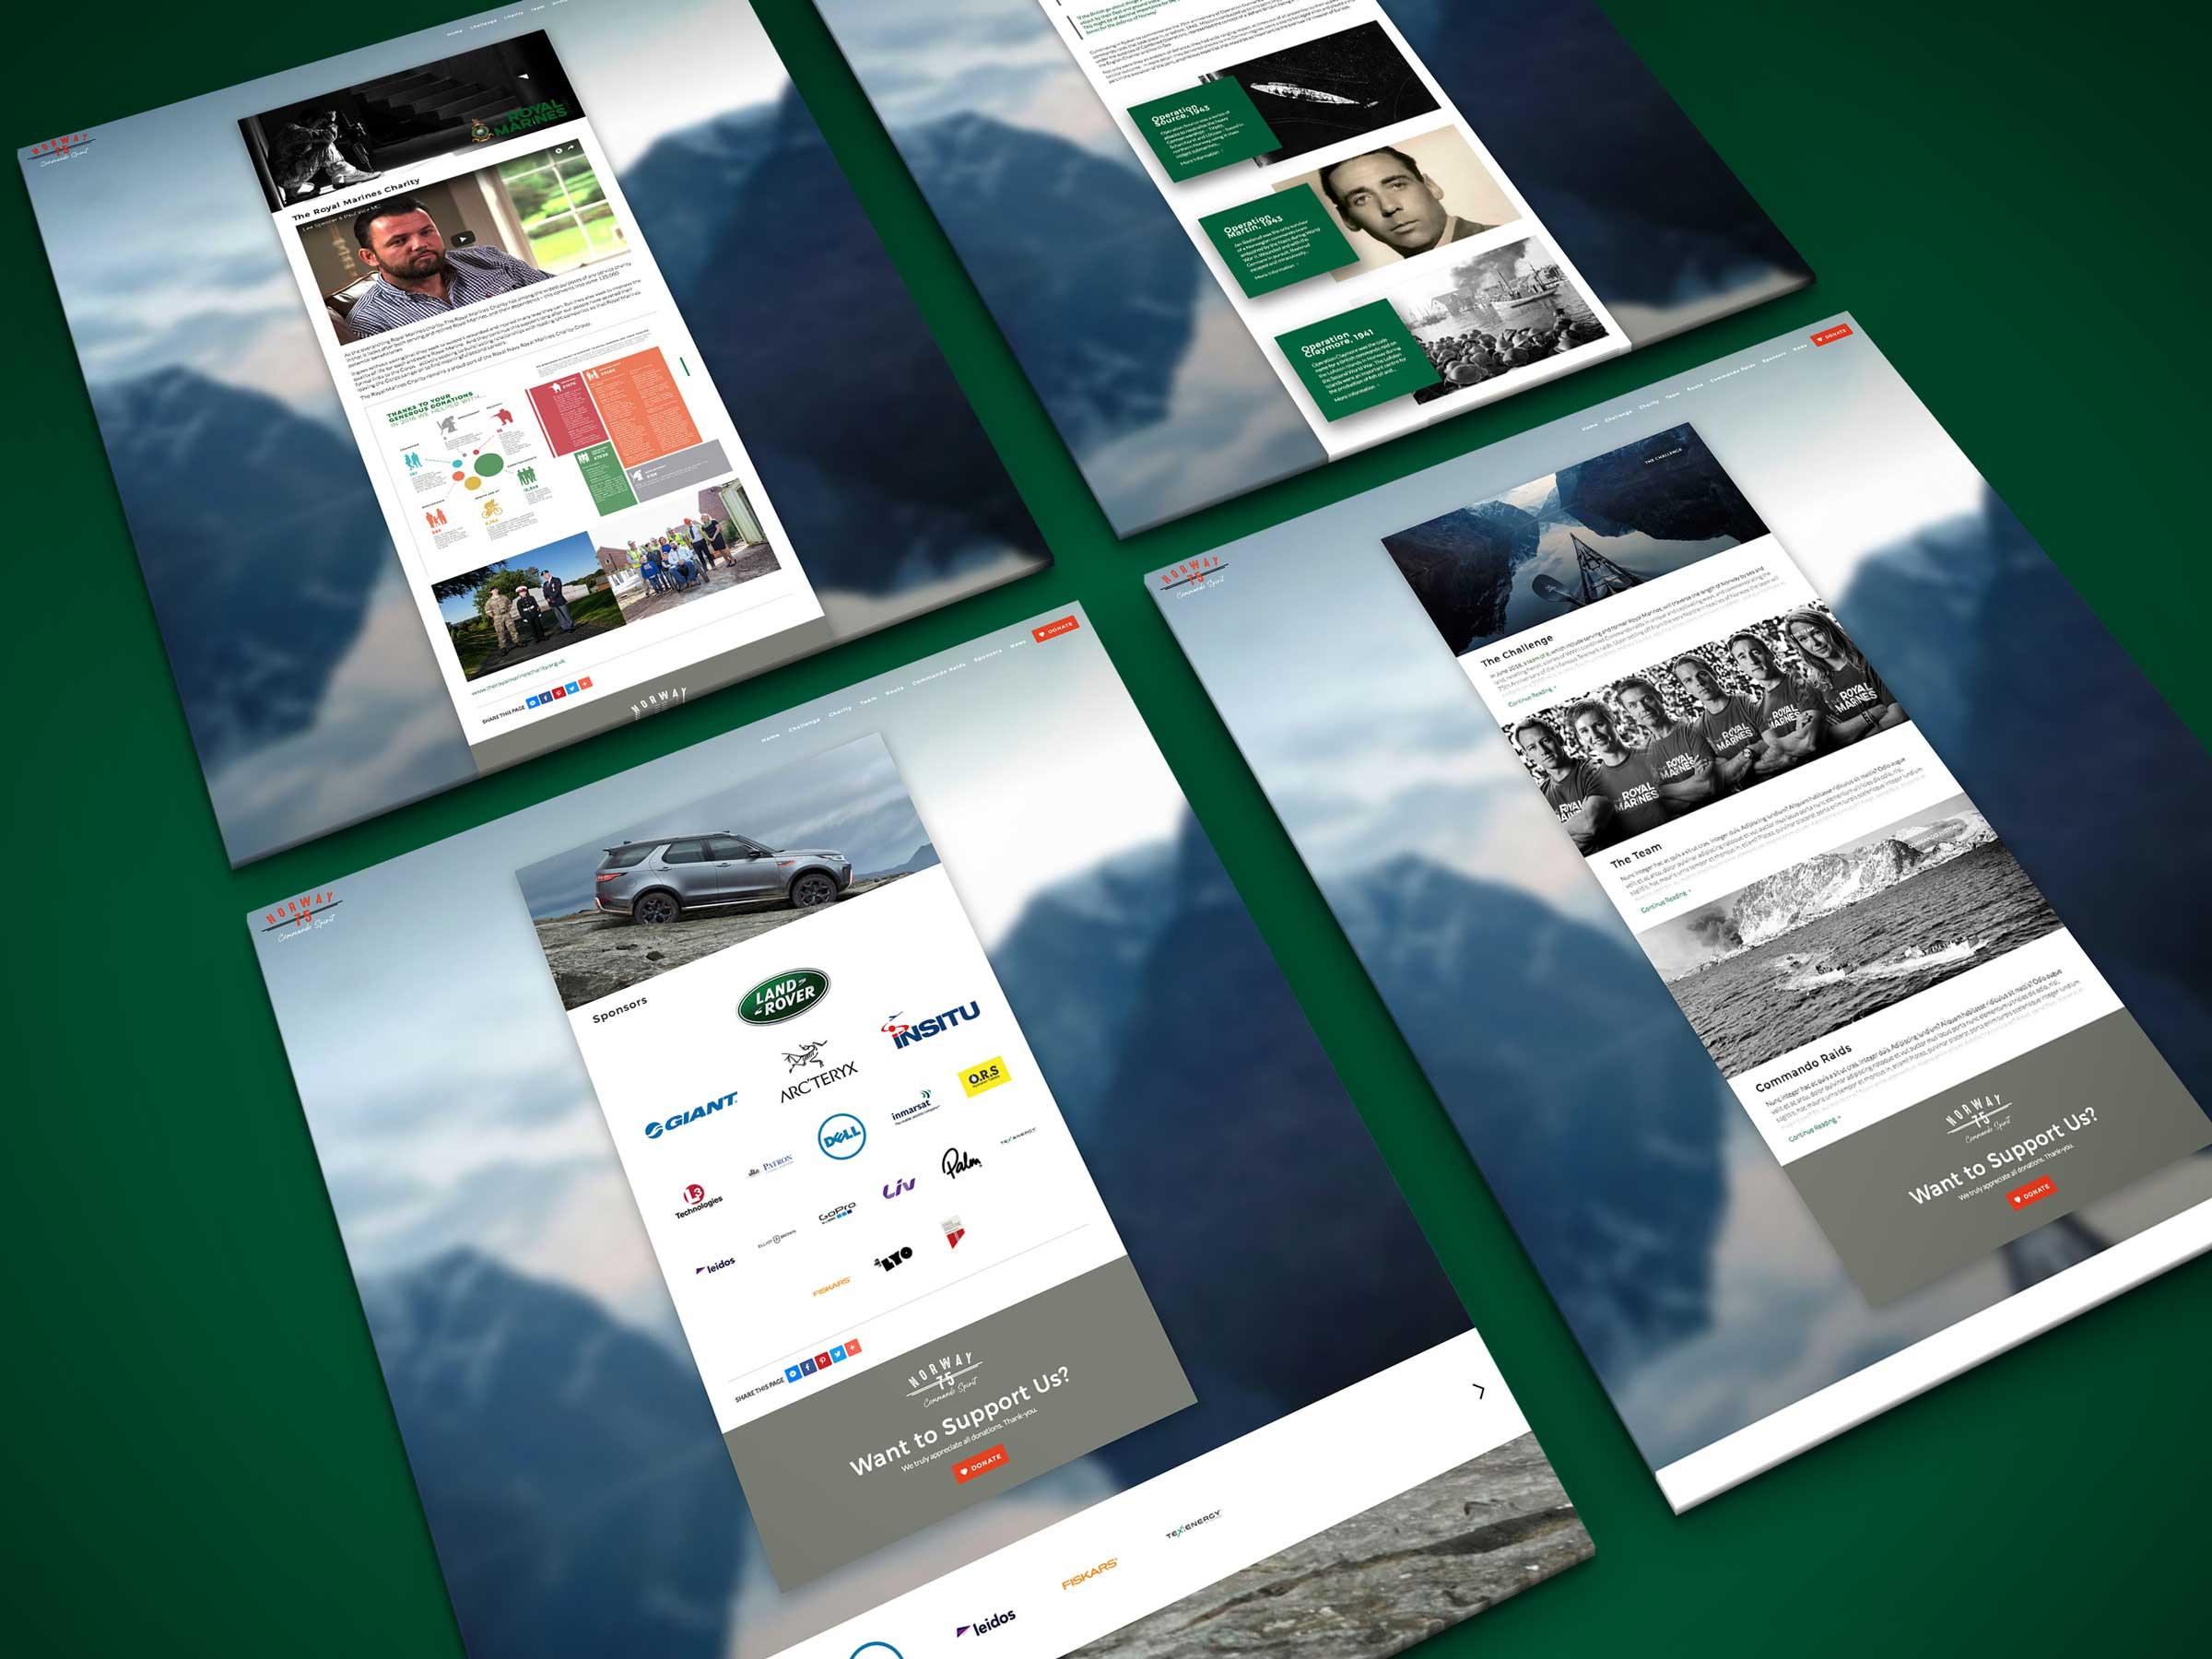 Royal Marines website platform